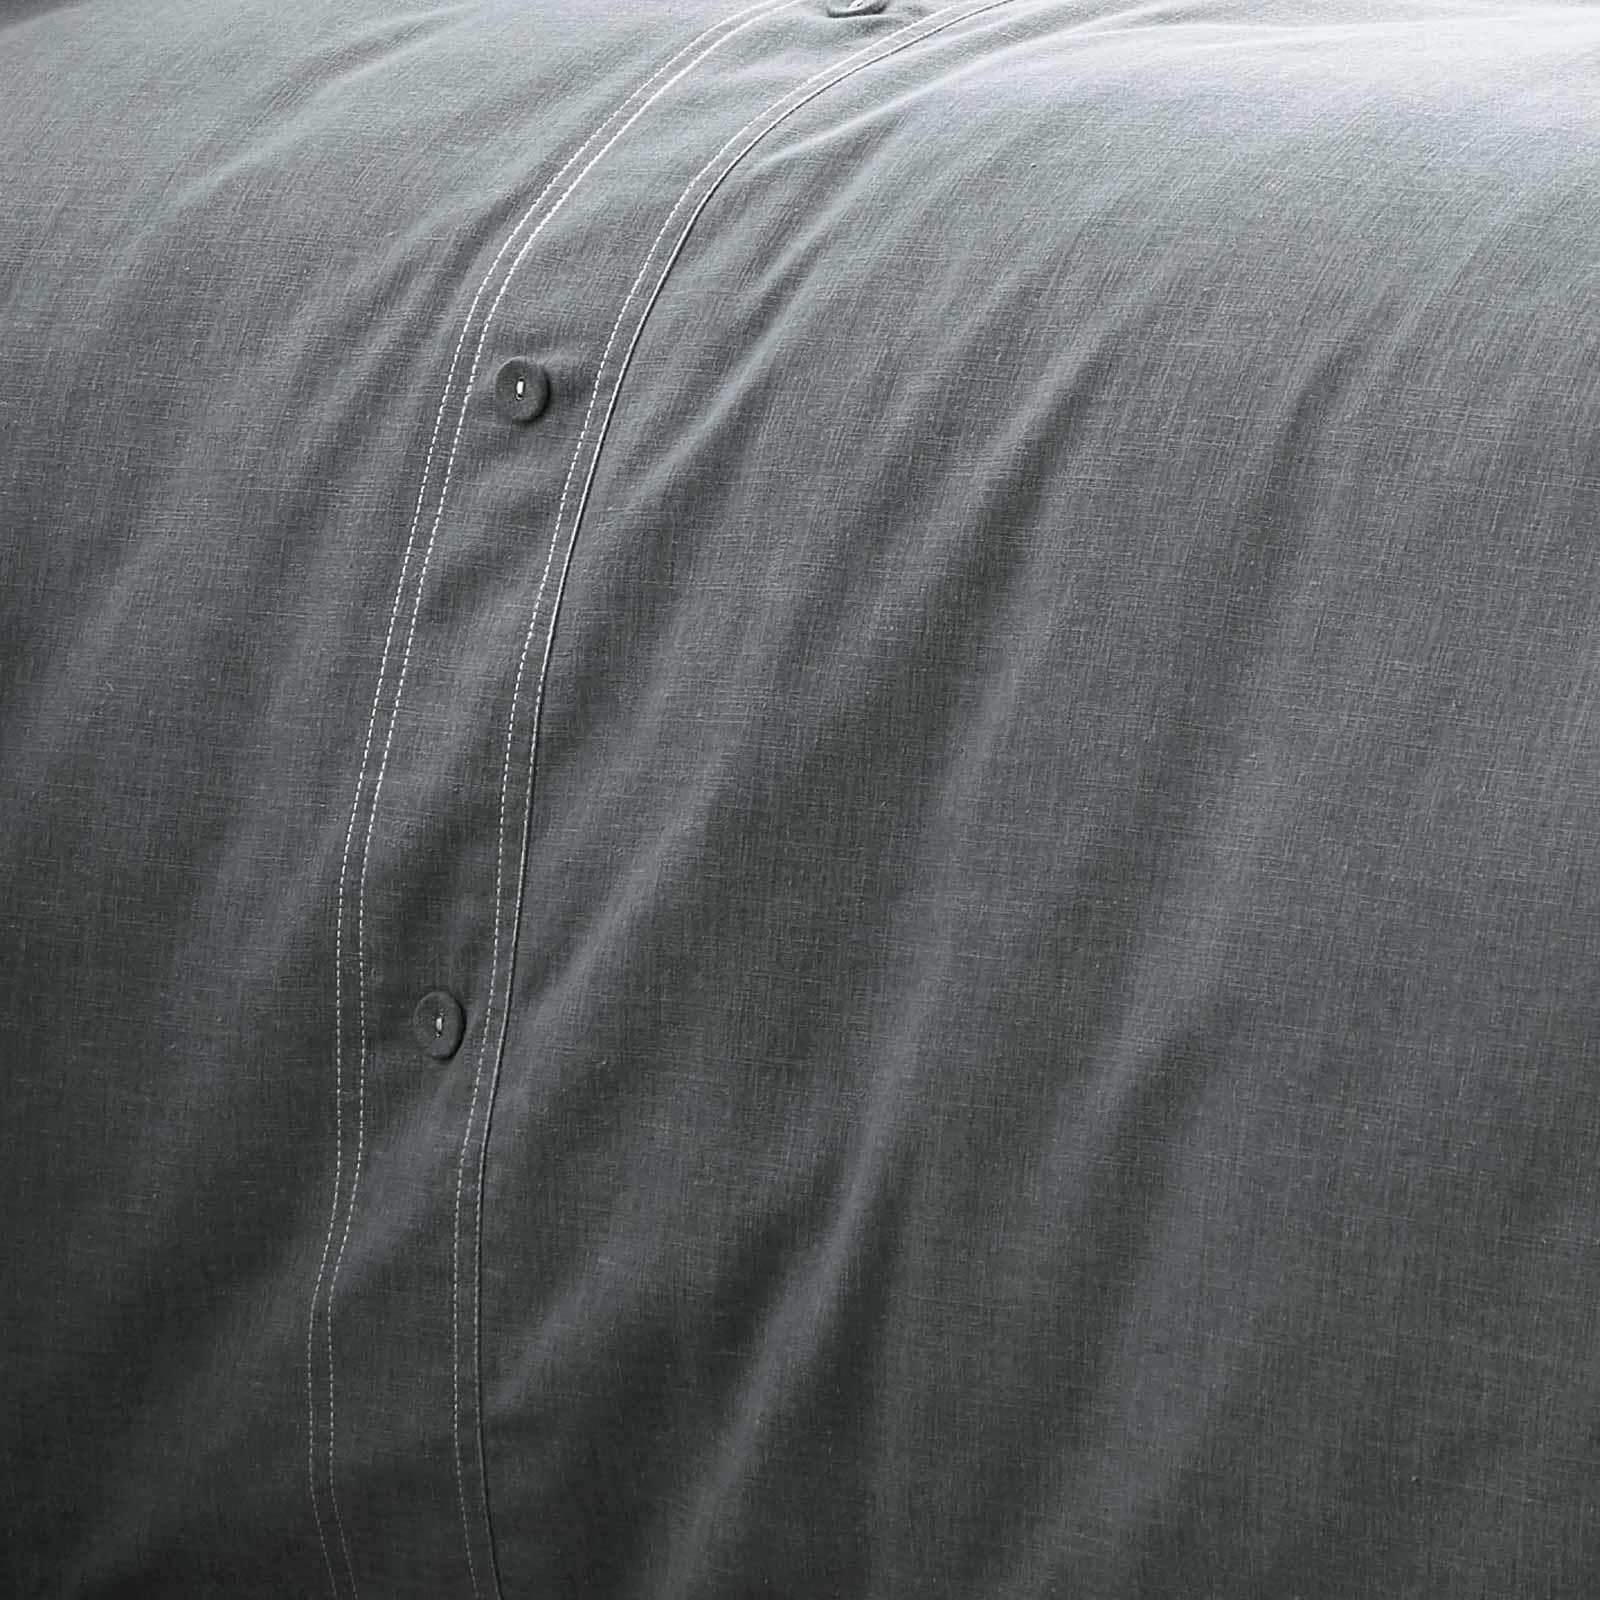 Azul-fundas-nordicas-Denim-Chambray-Boton-Detalle-de-lujo-cubierta-del-edredon-conjuntos-de-cama miniatura 8